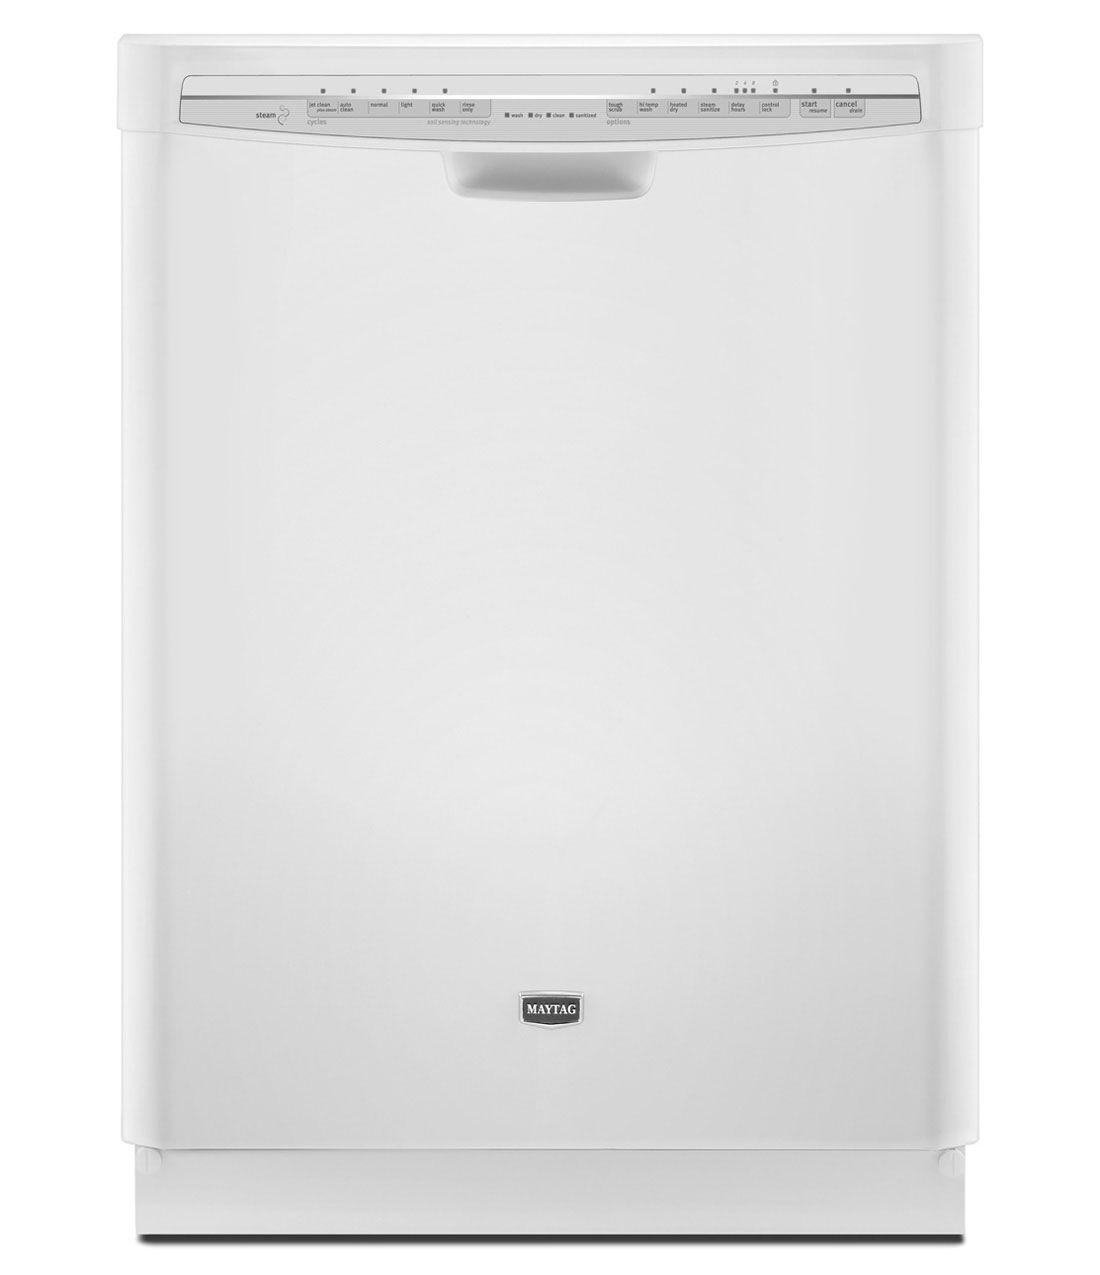 Maytag Jetclean Plus Dishwasher With 100 Stainless Steel Tub Interior Mdb7749saw White Laundry Appliances Maytag Kitchen Maytag